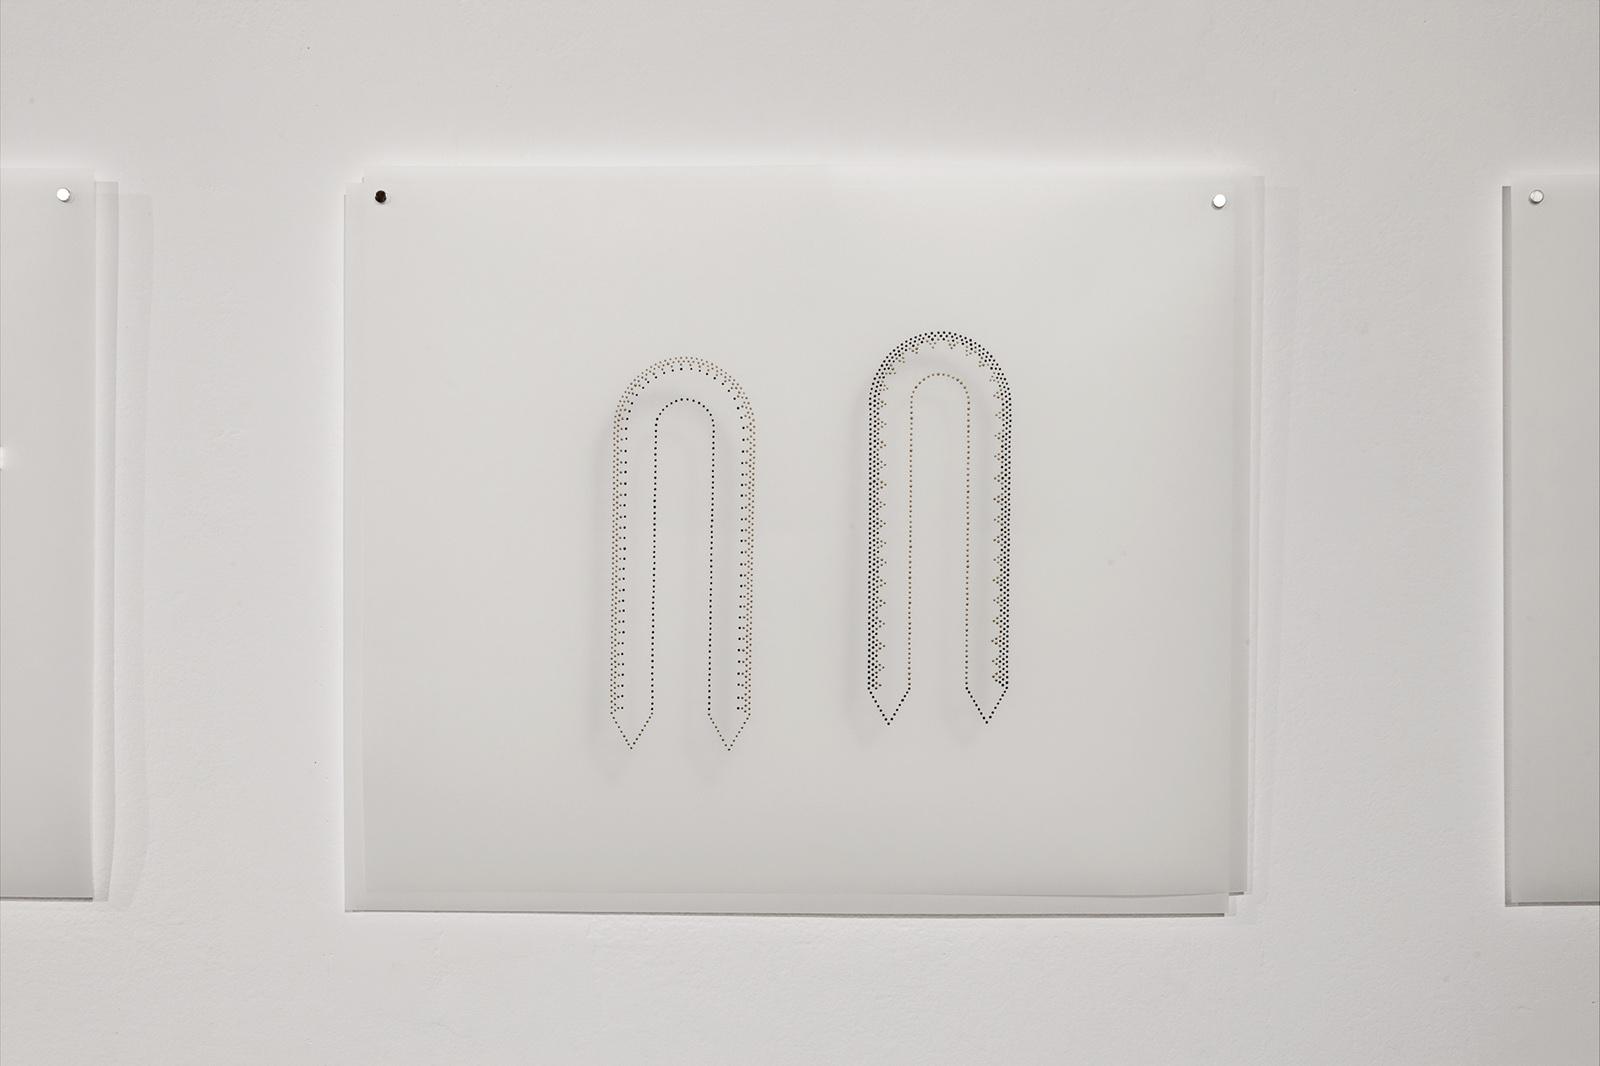 """Garlanding #5"". From the Garlanding series. 2018-2019. Acrylic gouache on vellum. 14 x 17 inches each."